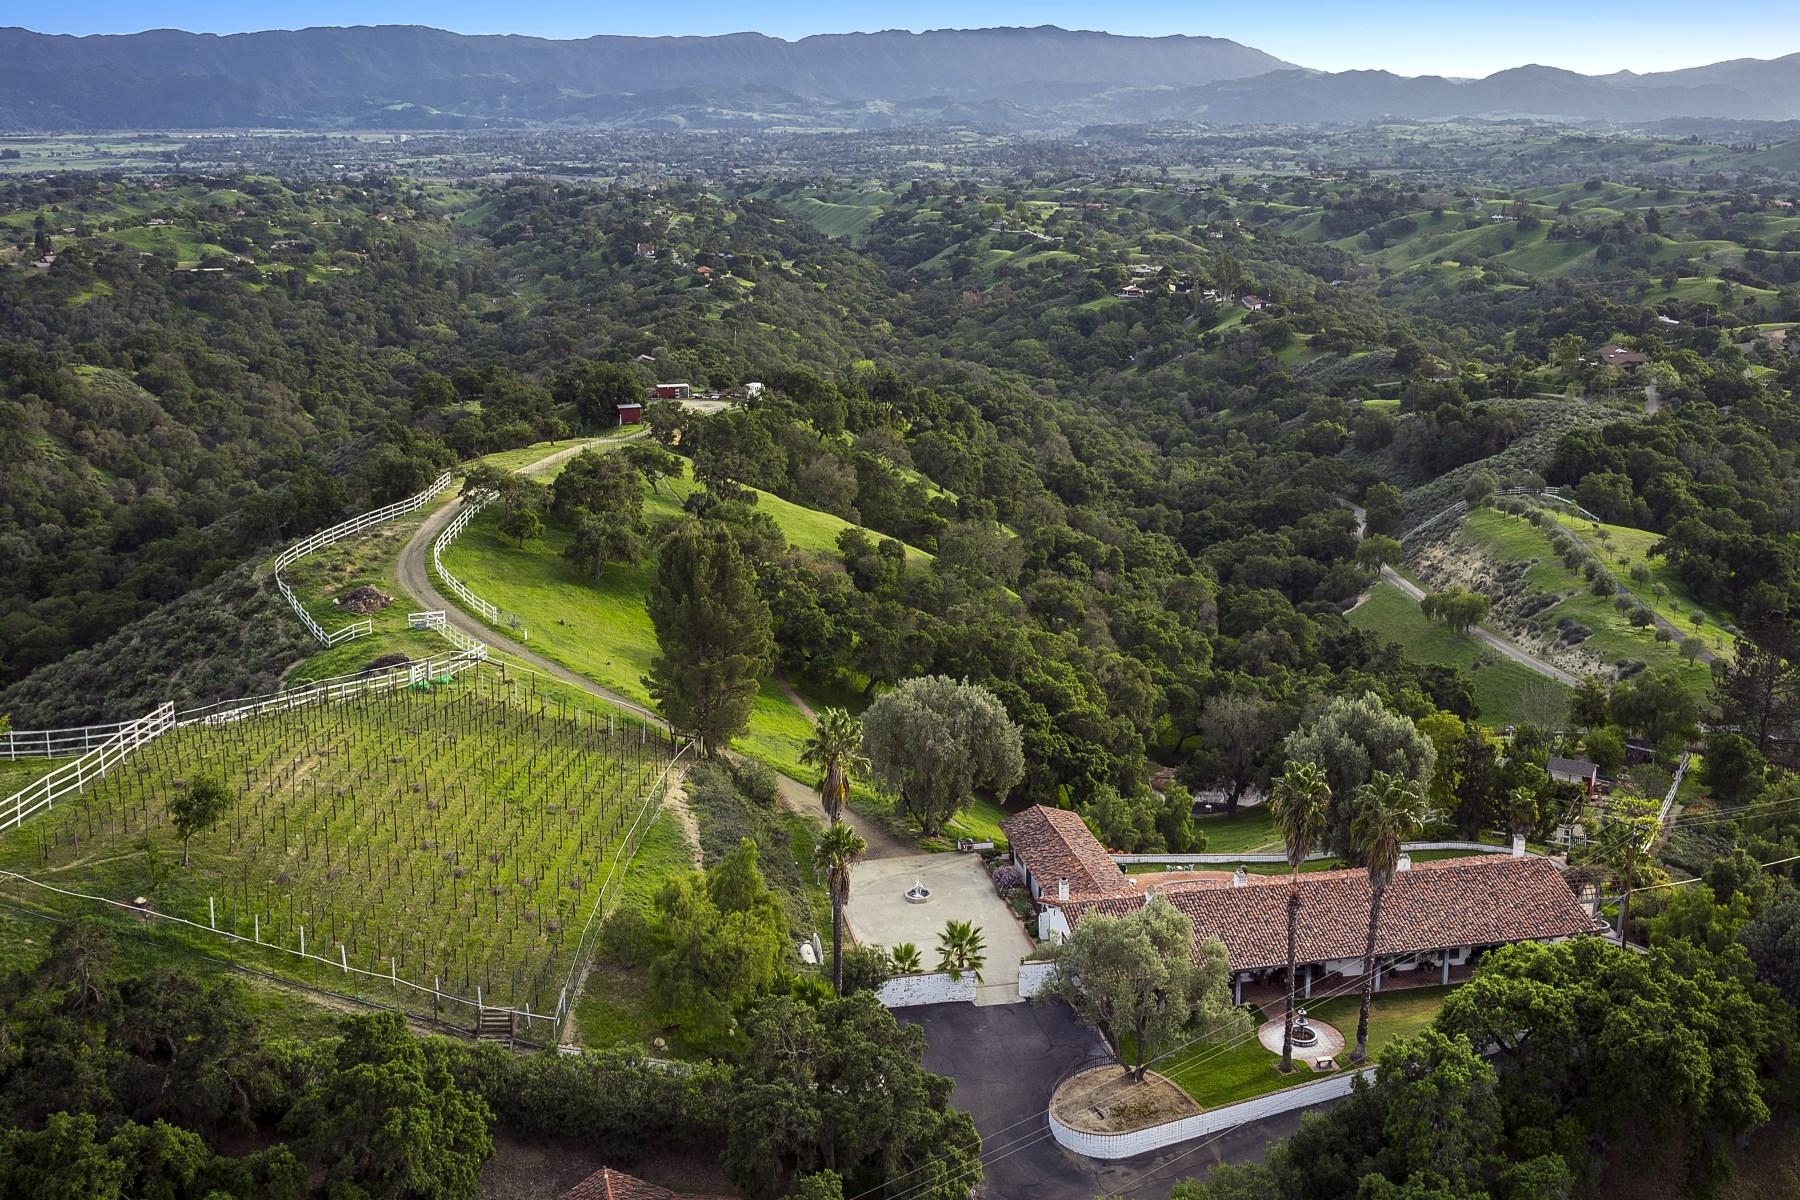 Land for Sale at Panoramic Santa Ynez Valley Views 4000 West Oak Trail Road Santa Ynez, California, 93460 United States